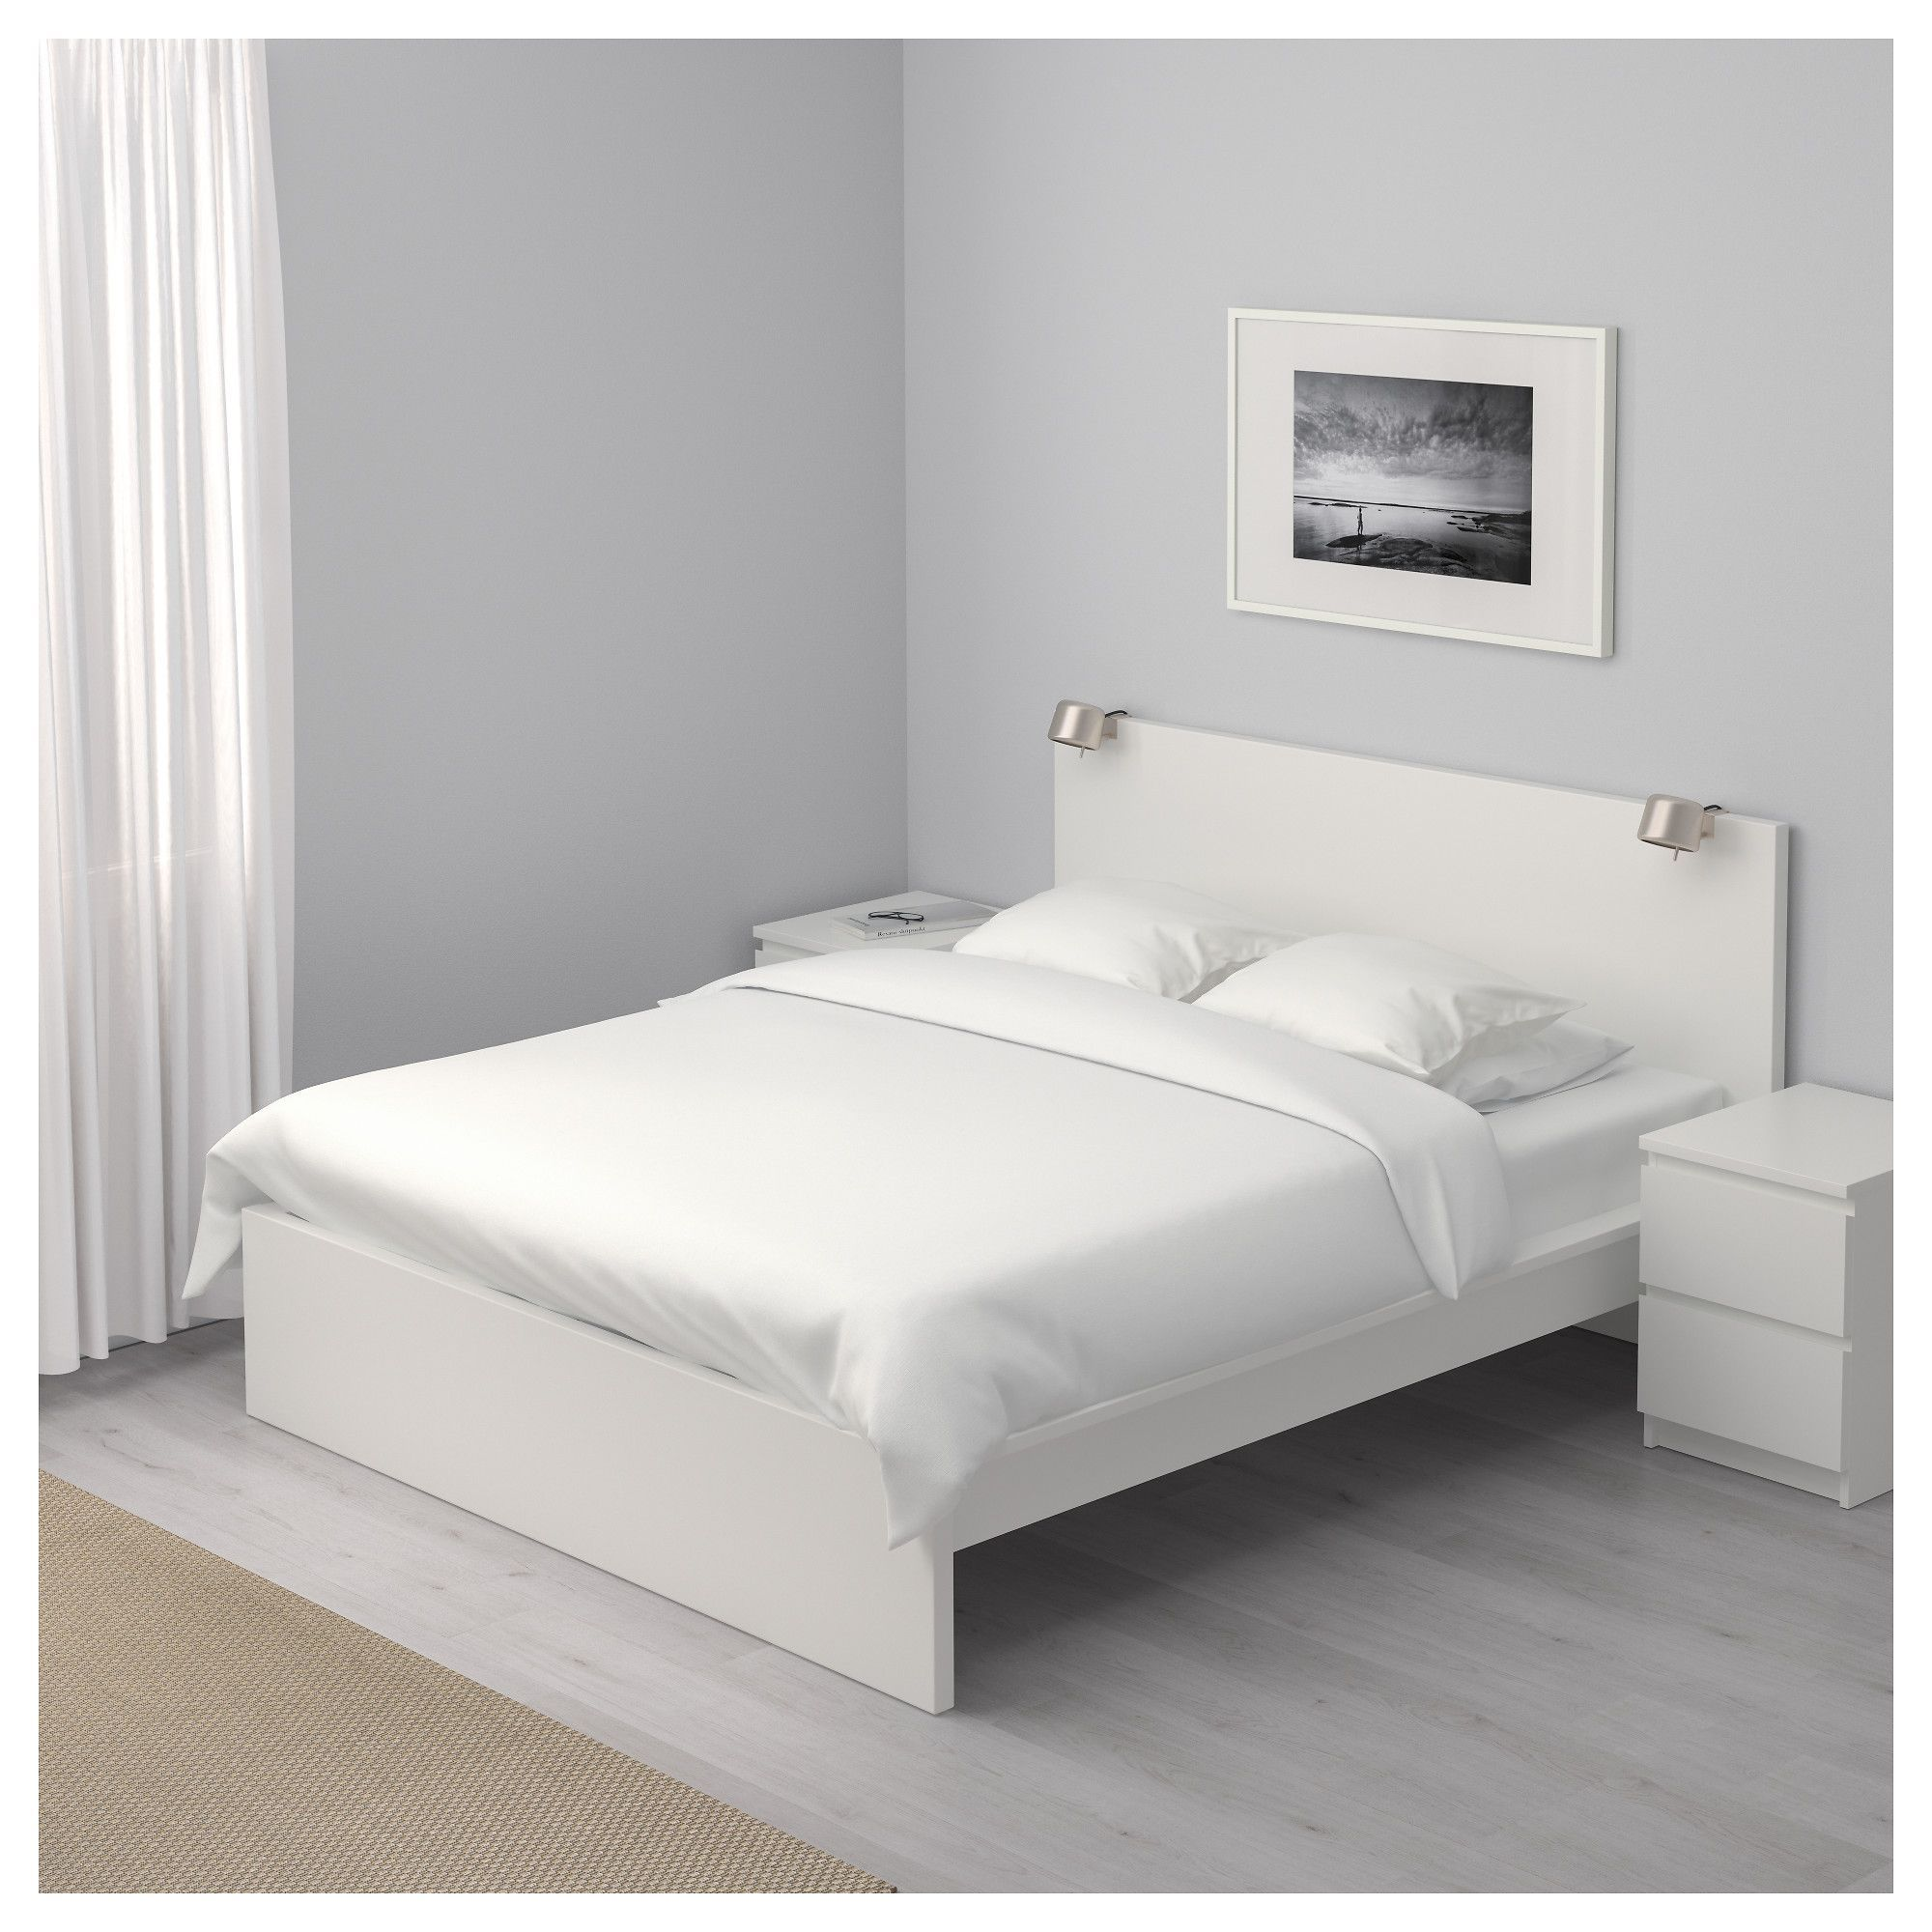 IKEA MALM Bed frame, high White/luröy Standard Double